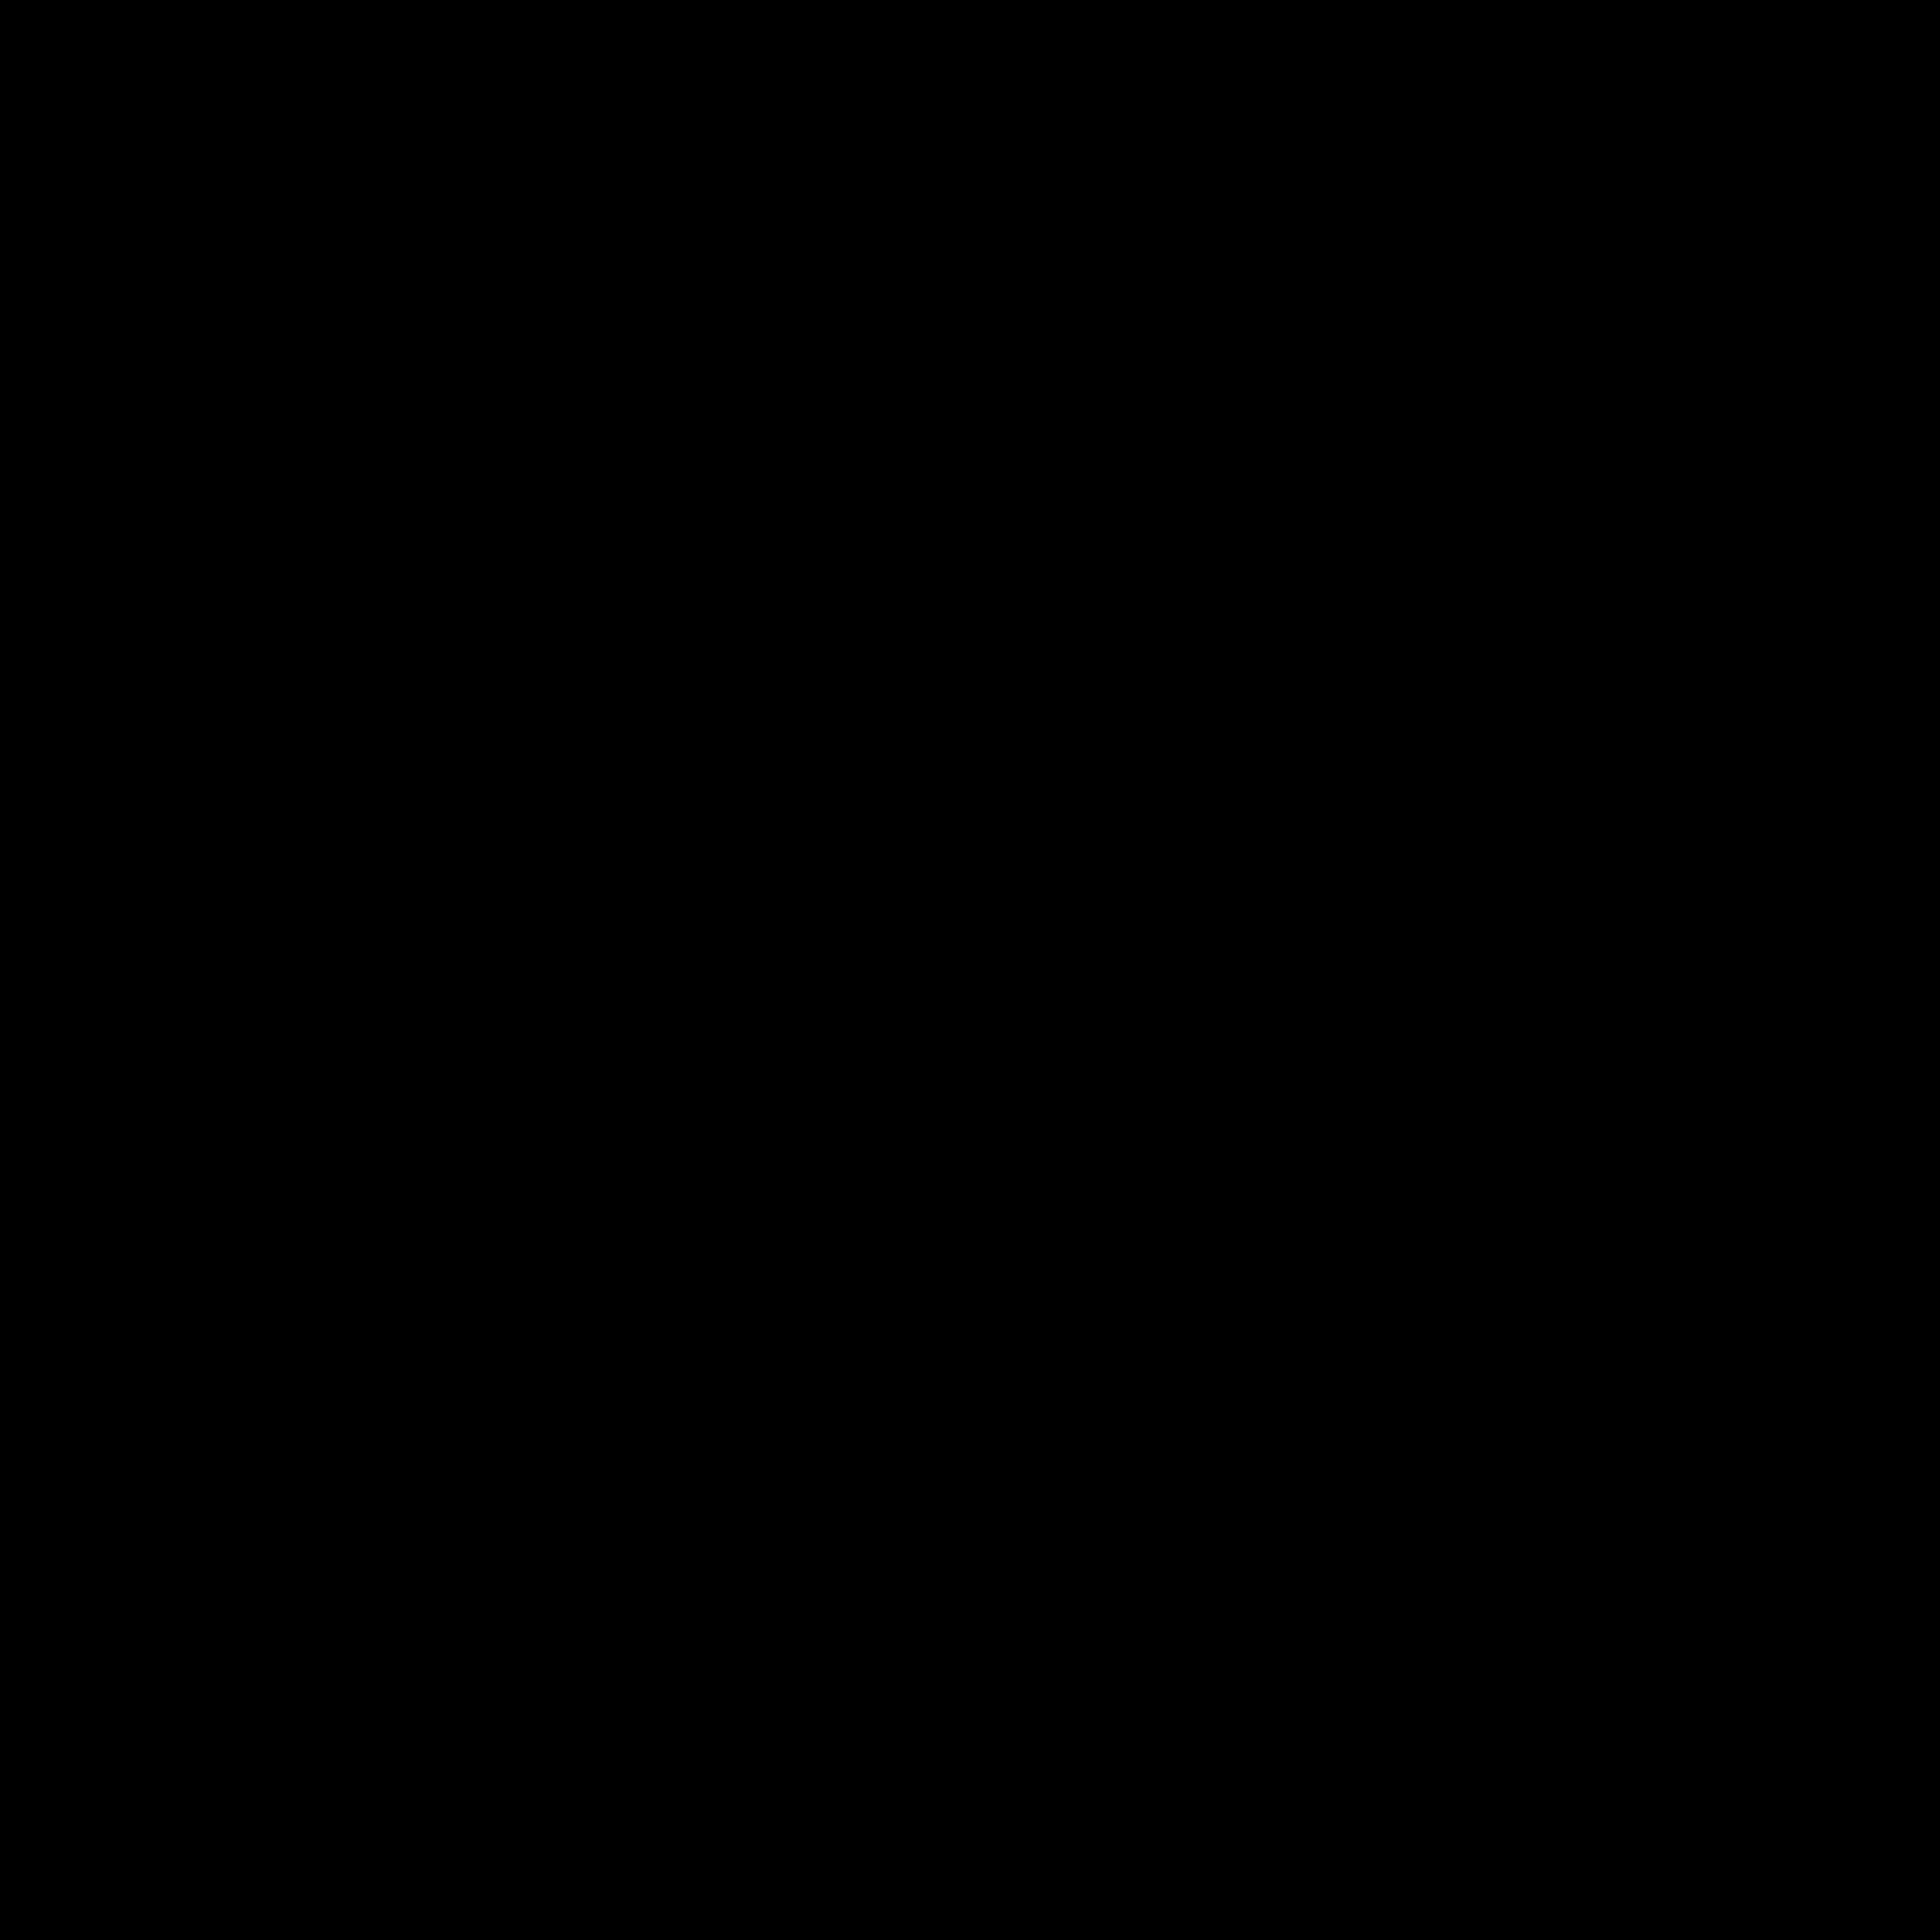 United States Female Woman Organization.